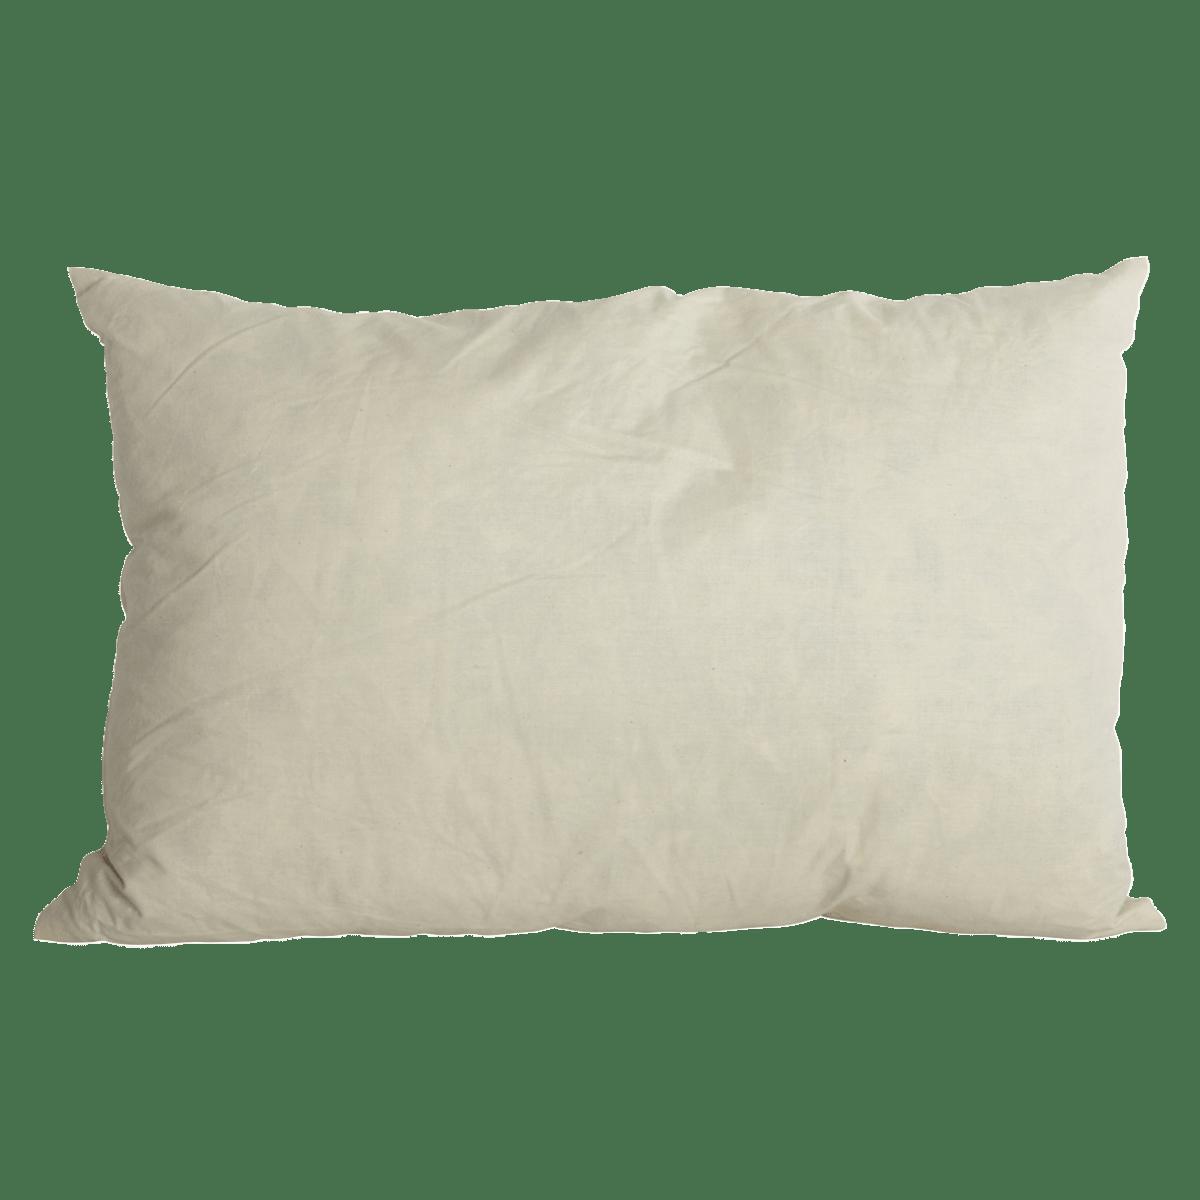 Bílý polštář 40x60 cm